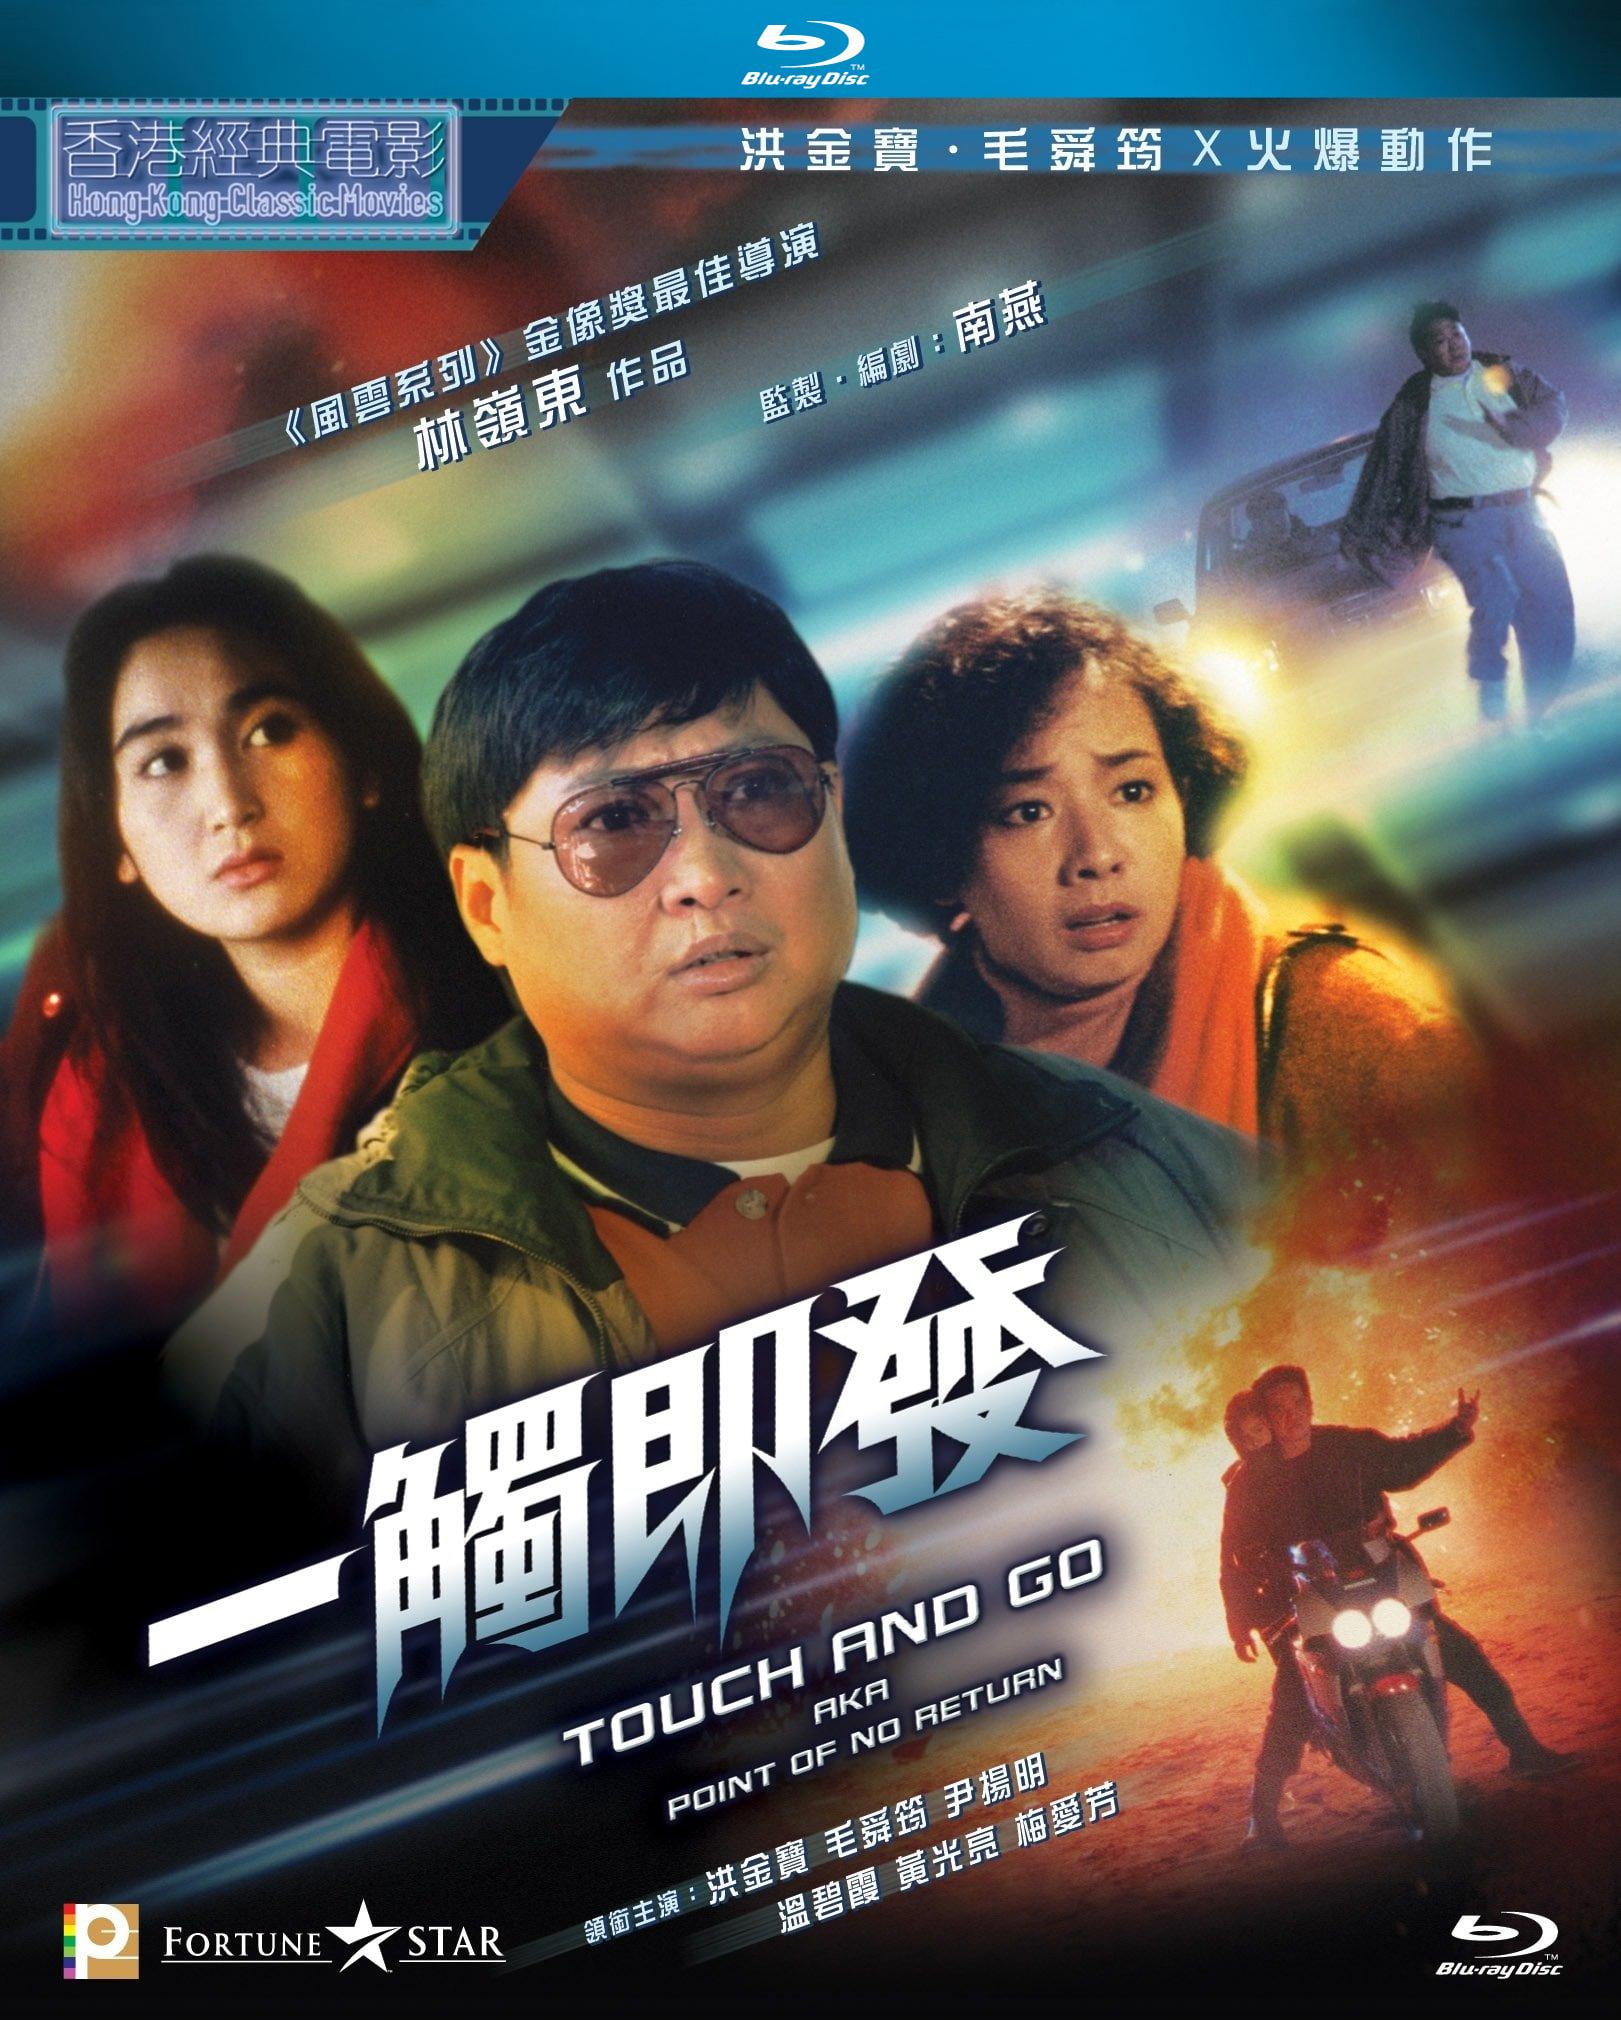 一觸即發 國粵雙語 原盤繁簡英SUP字幕 Touch and Go 1991 BluRay 1080p 2Audio DTS-HD MA 2 0 x265.10bit-BeiTai